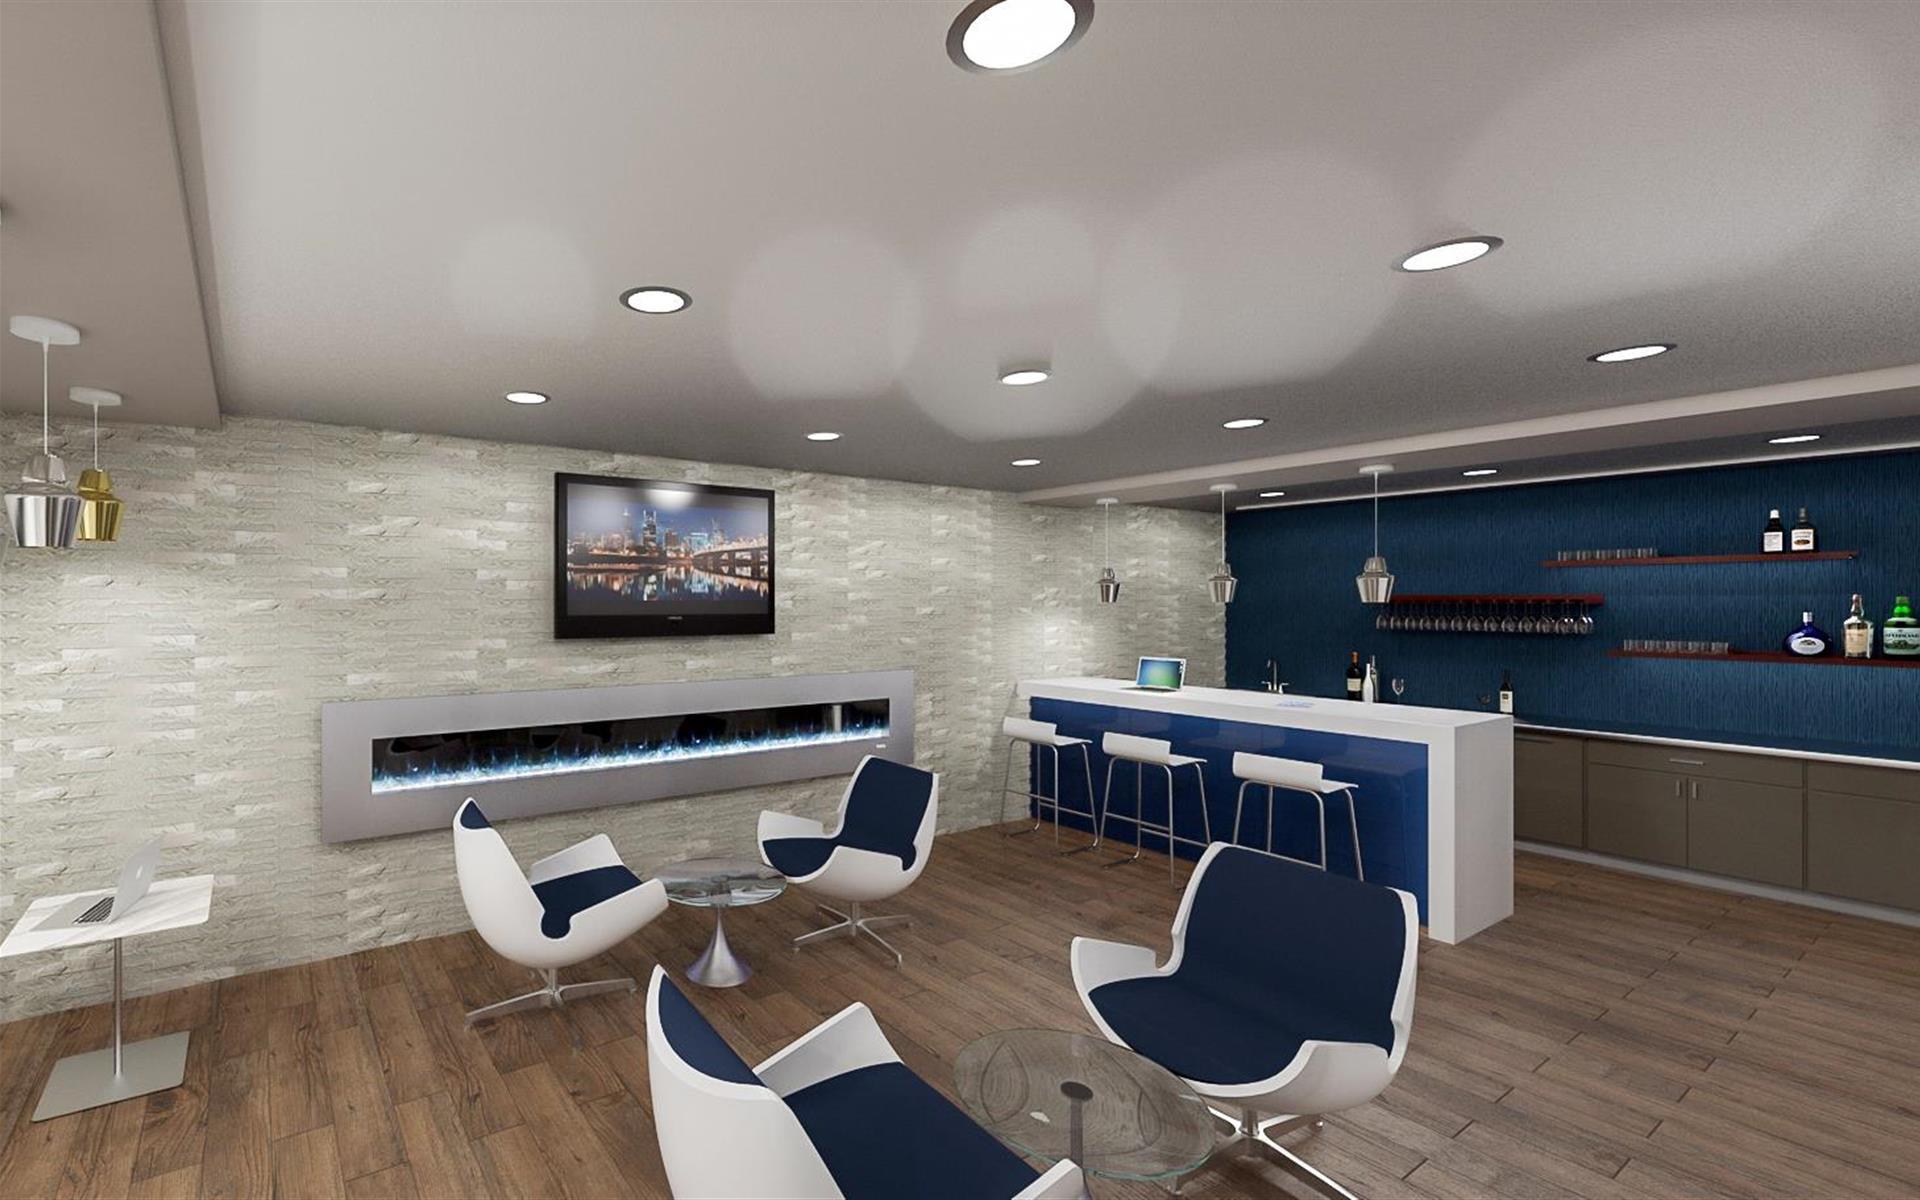 Metro Offices - One Metro Center - Metro Member Lounge